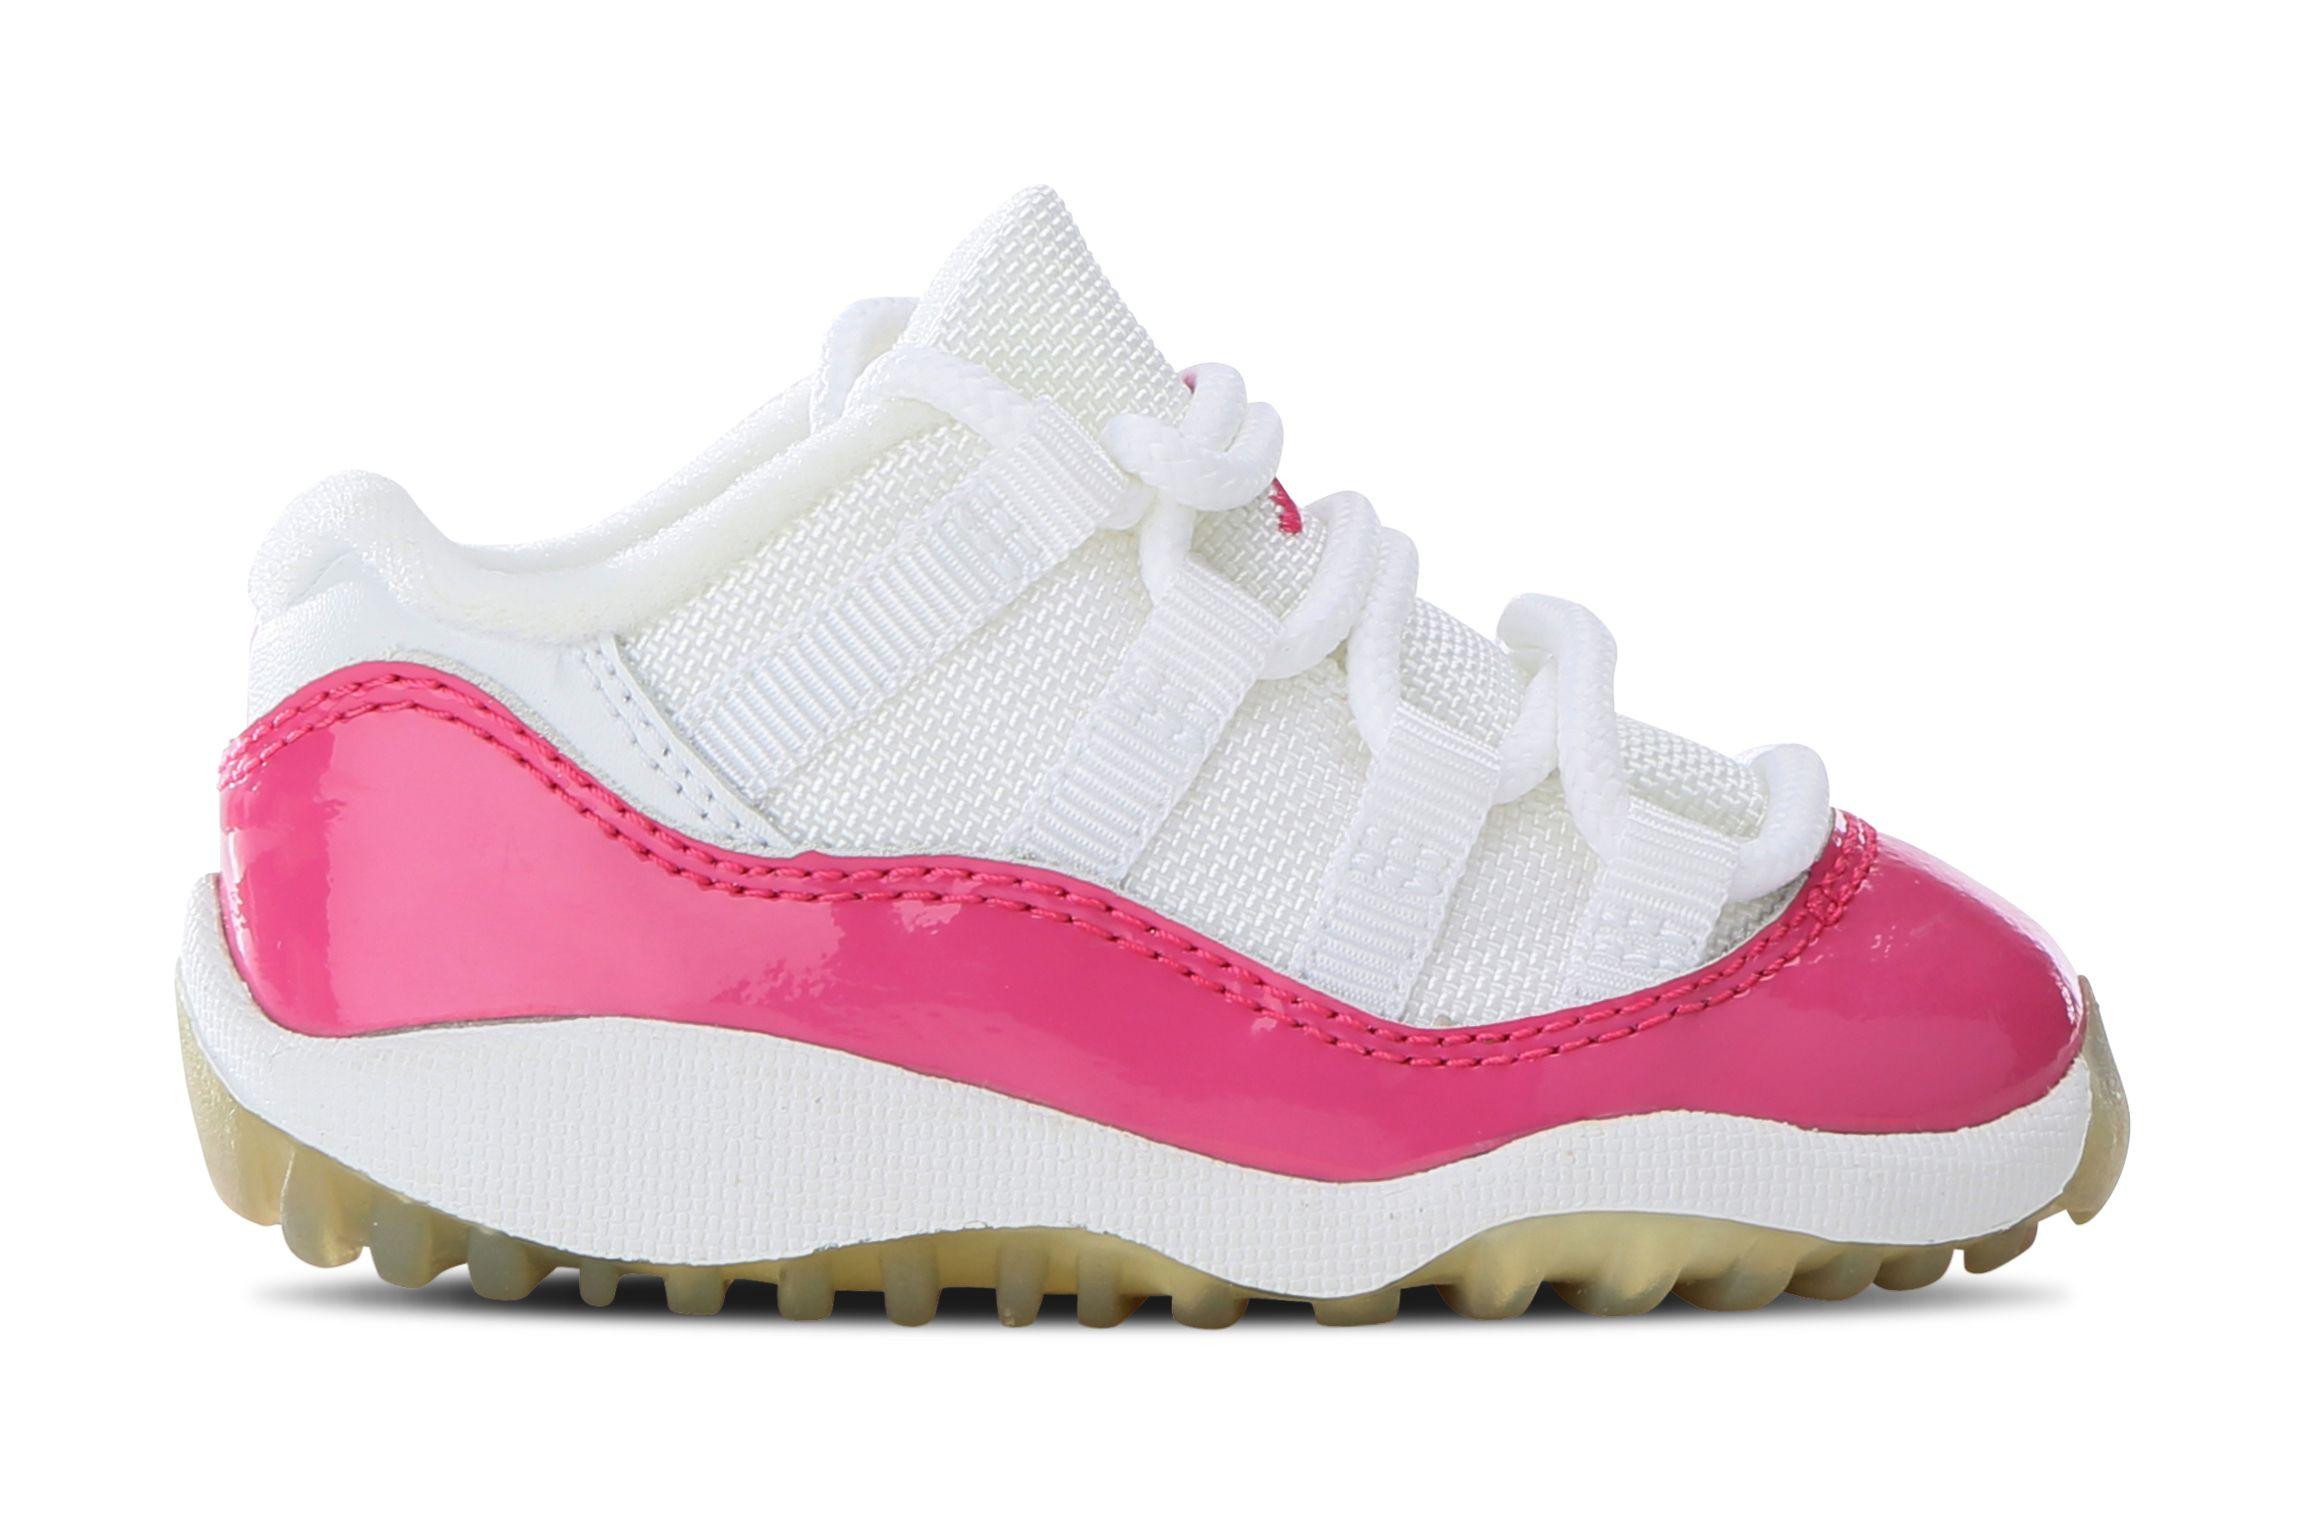 Busy Leung Air Jordan 11 Kids Pink Patent